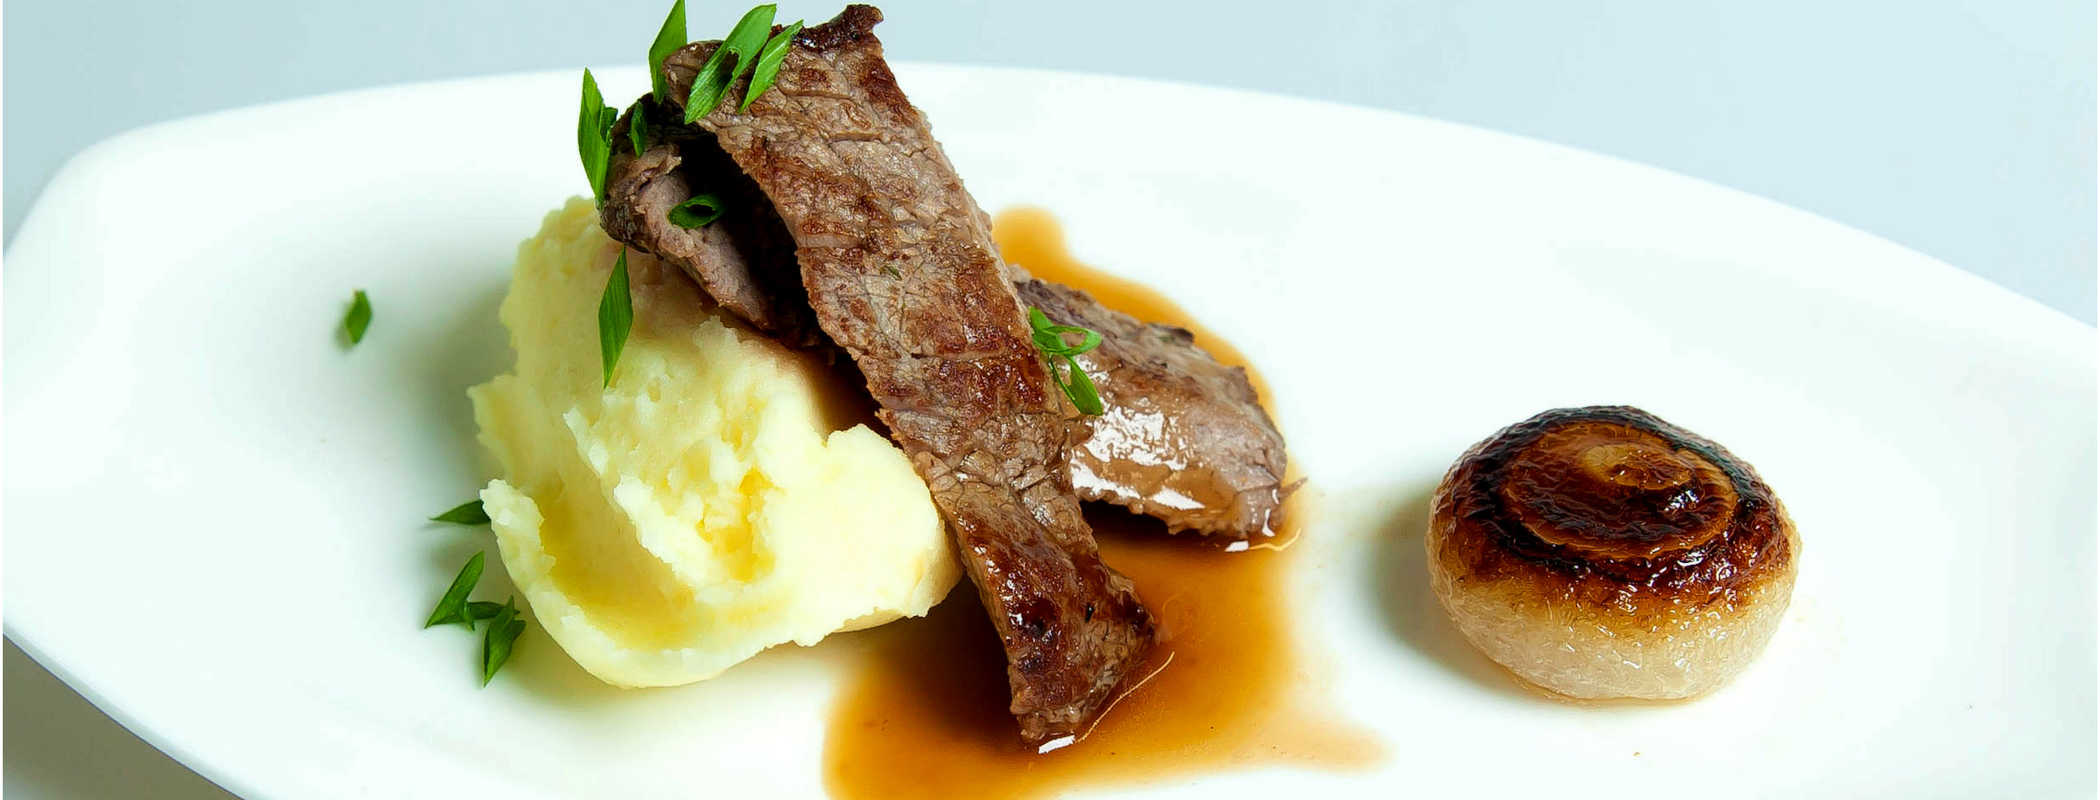 tasting plate 3